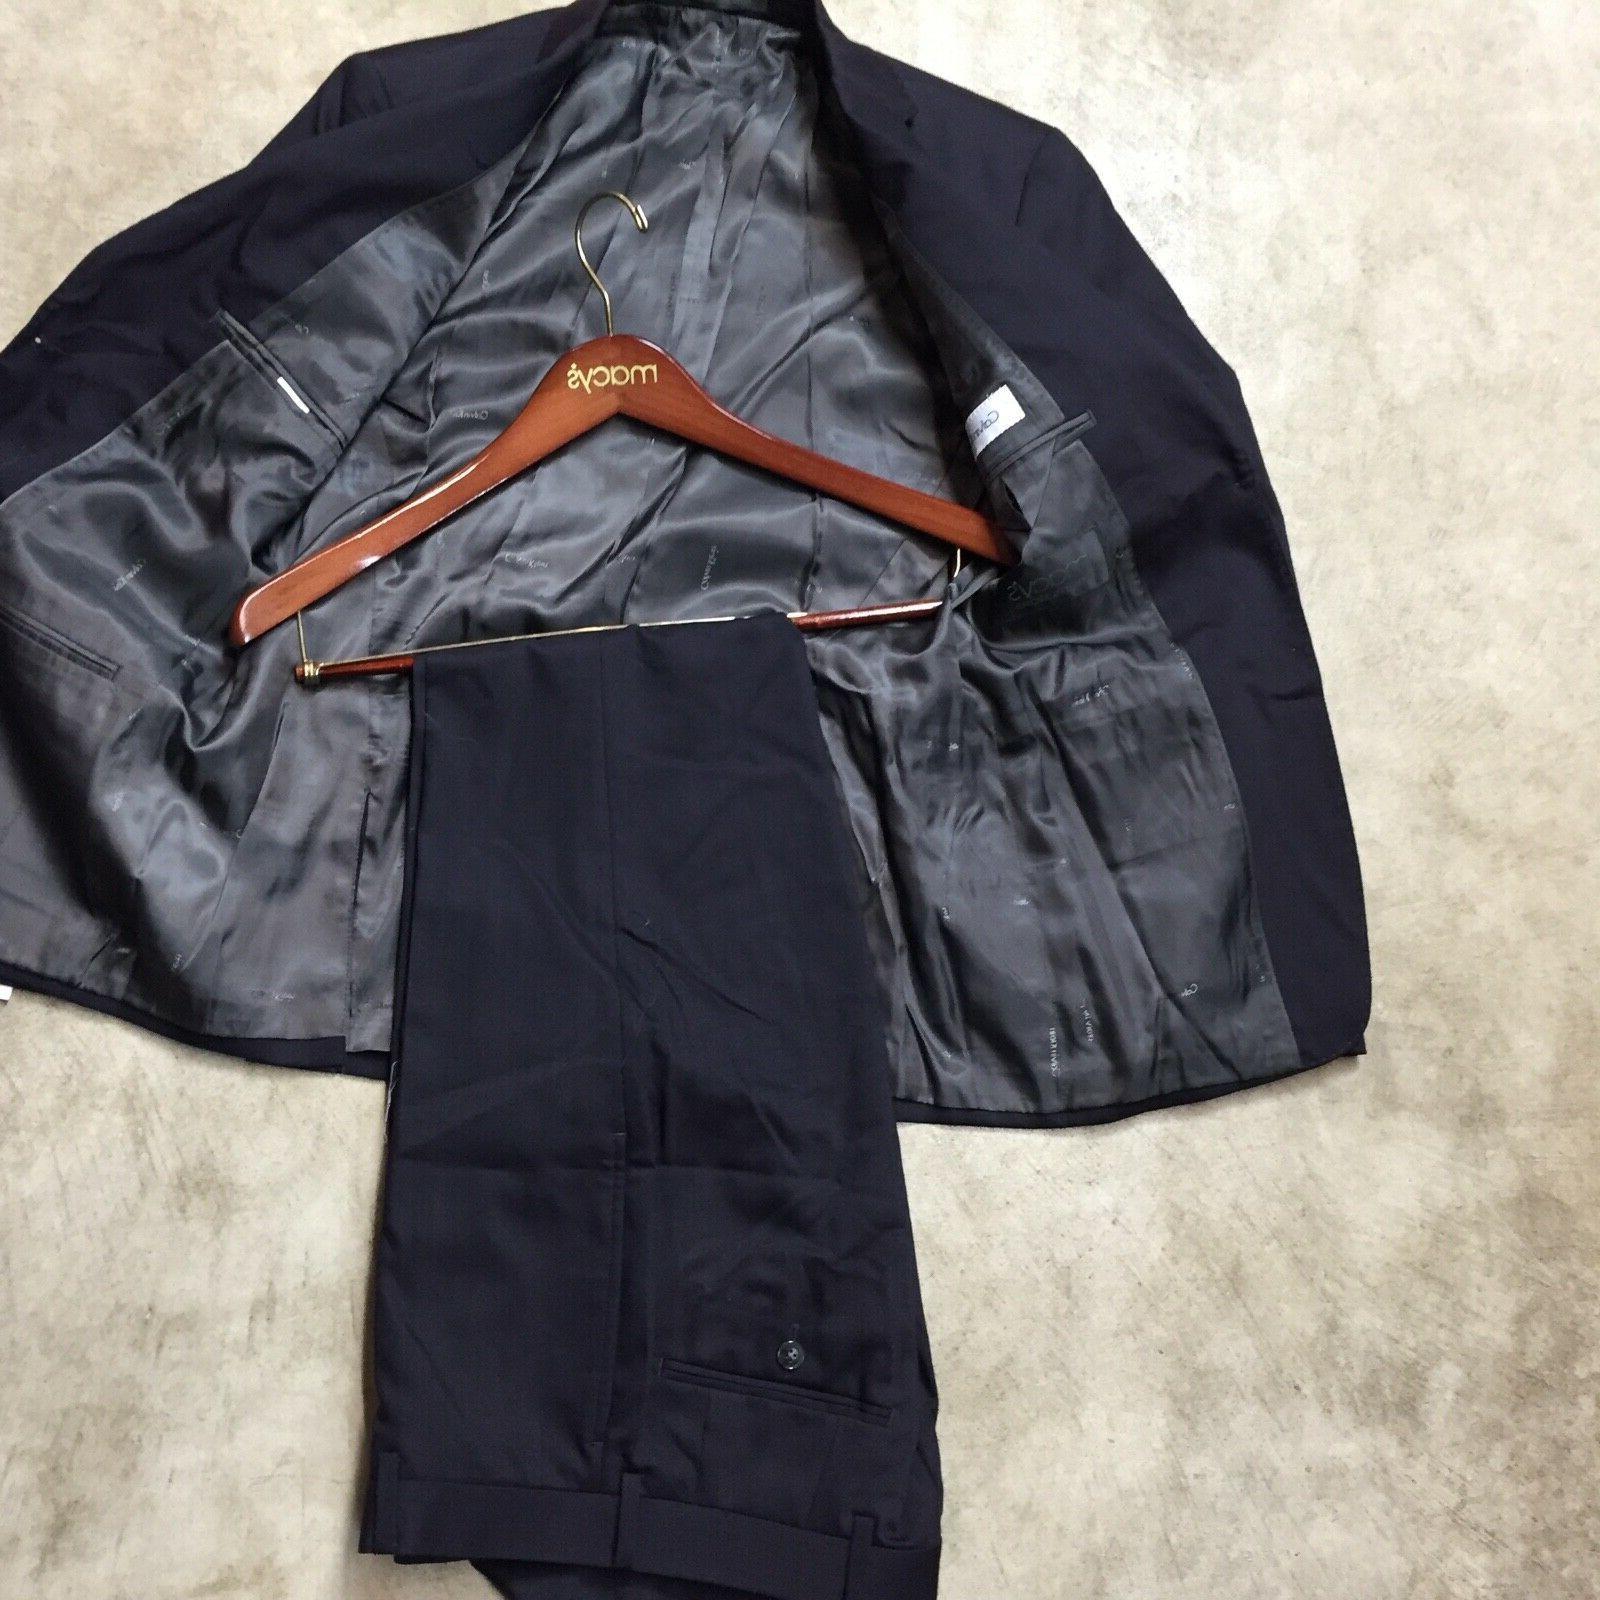 New mens extreme slim 2 suit jacket pants